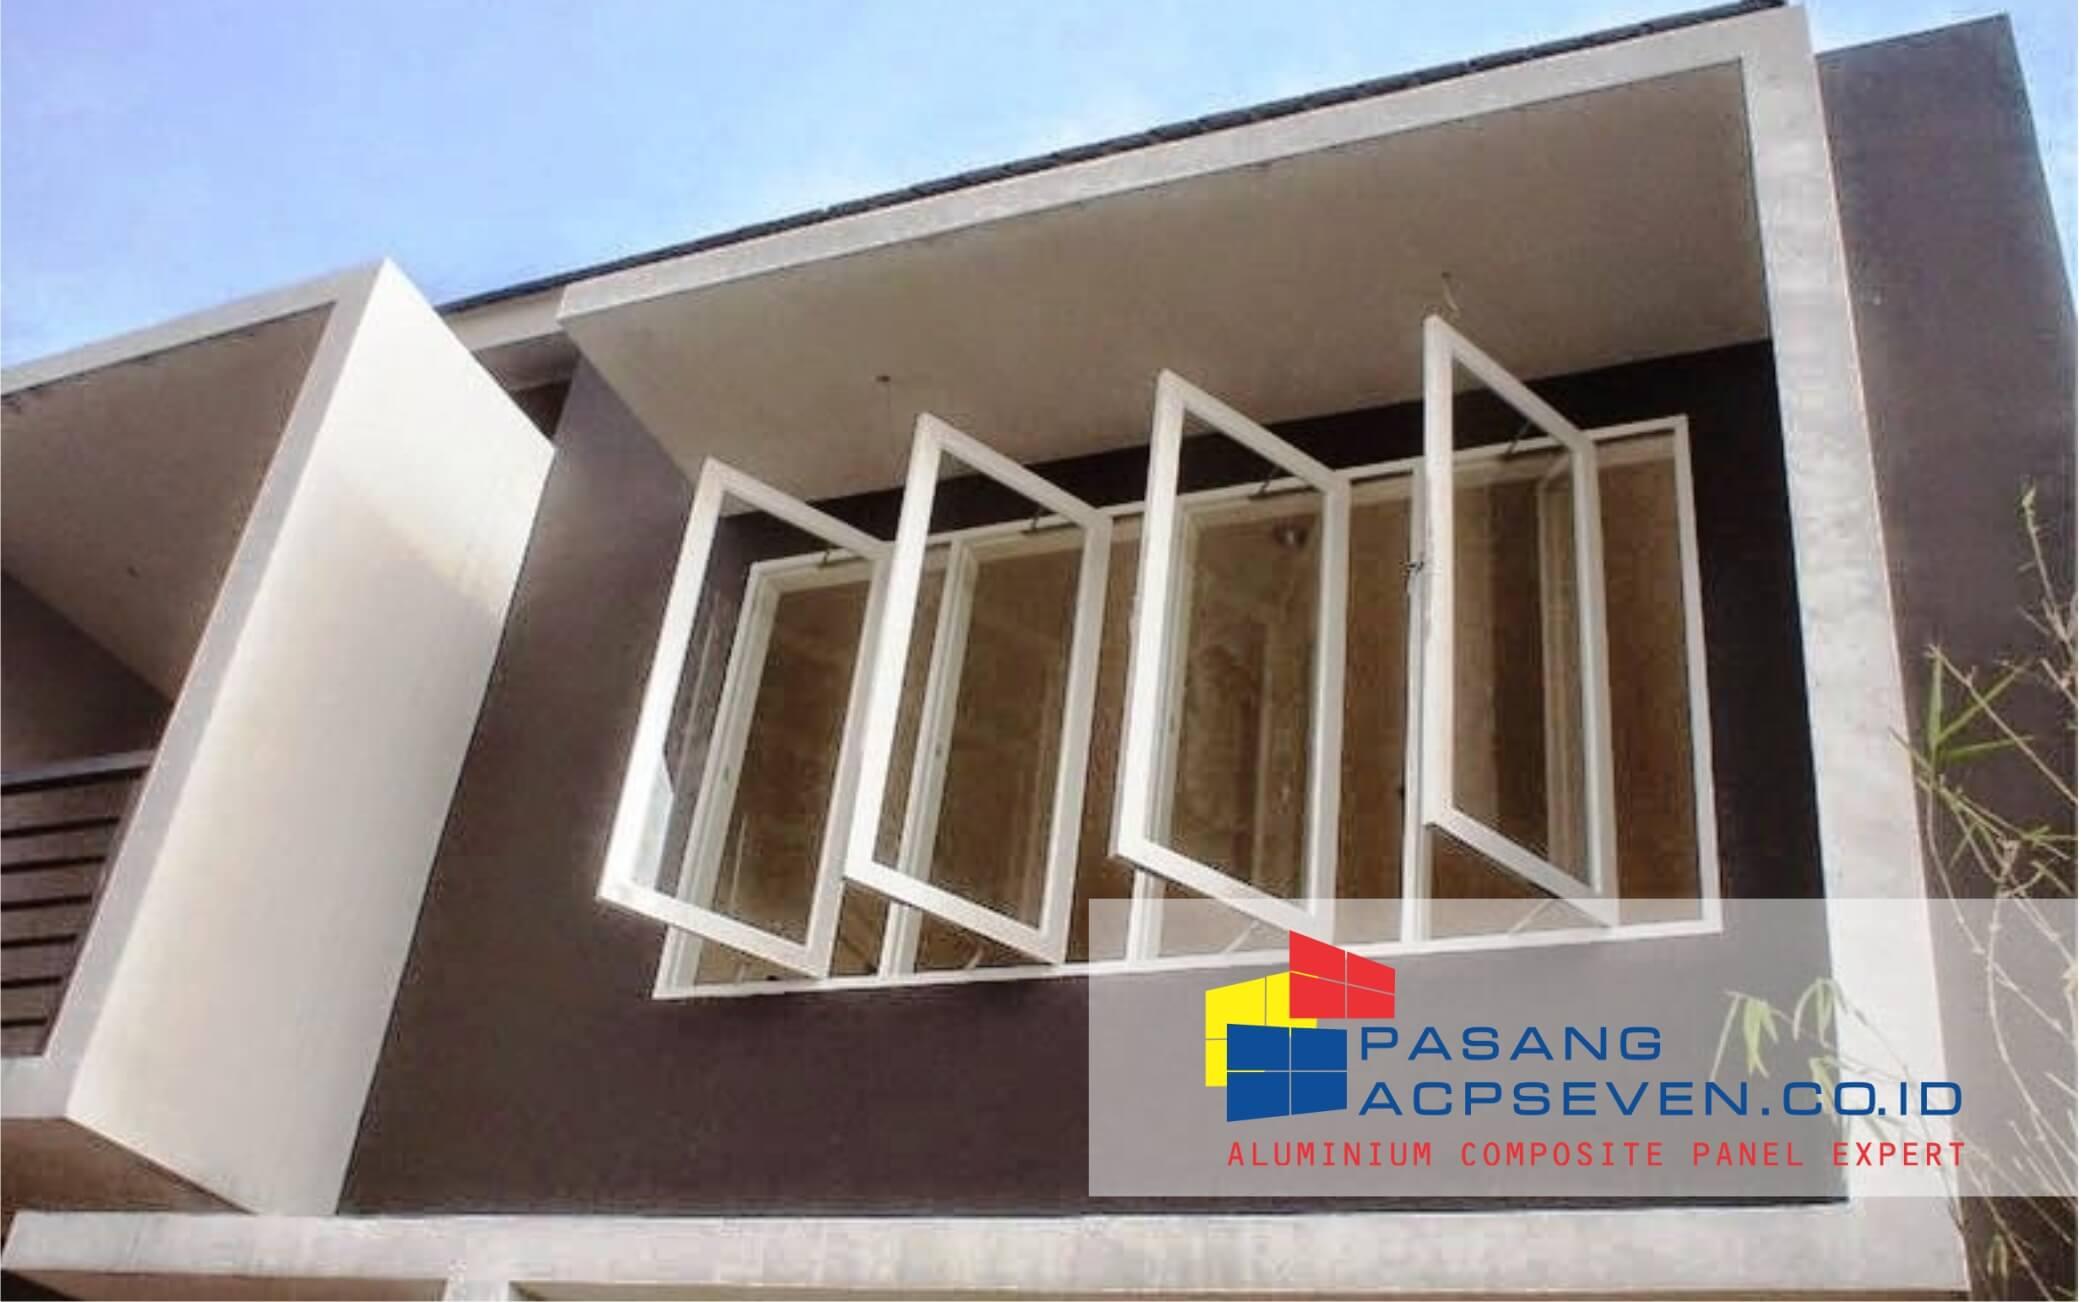 kusen jendela aluminium surabaya, kusen aluminium surabaya, kusen pintu aluminium surabaya